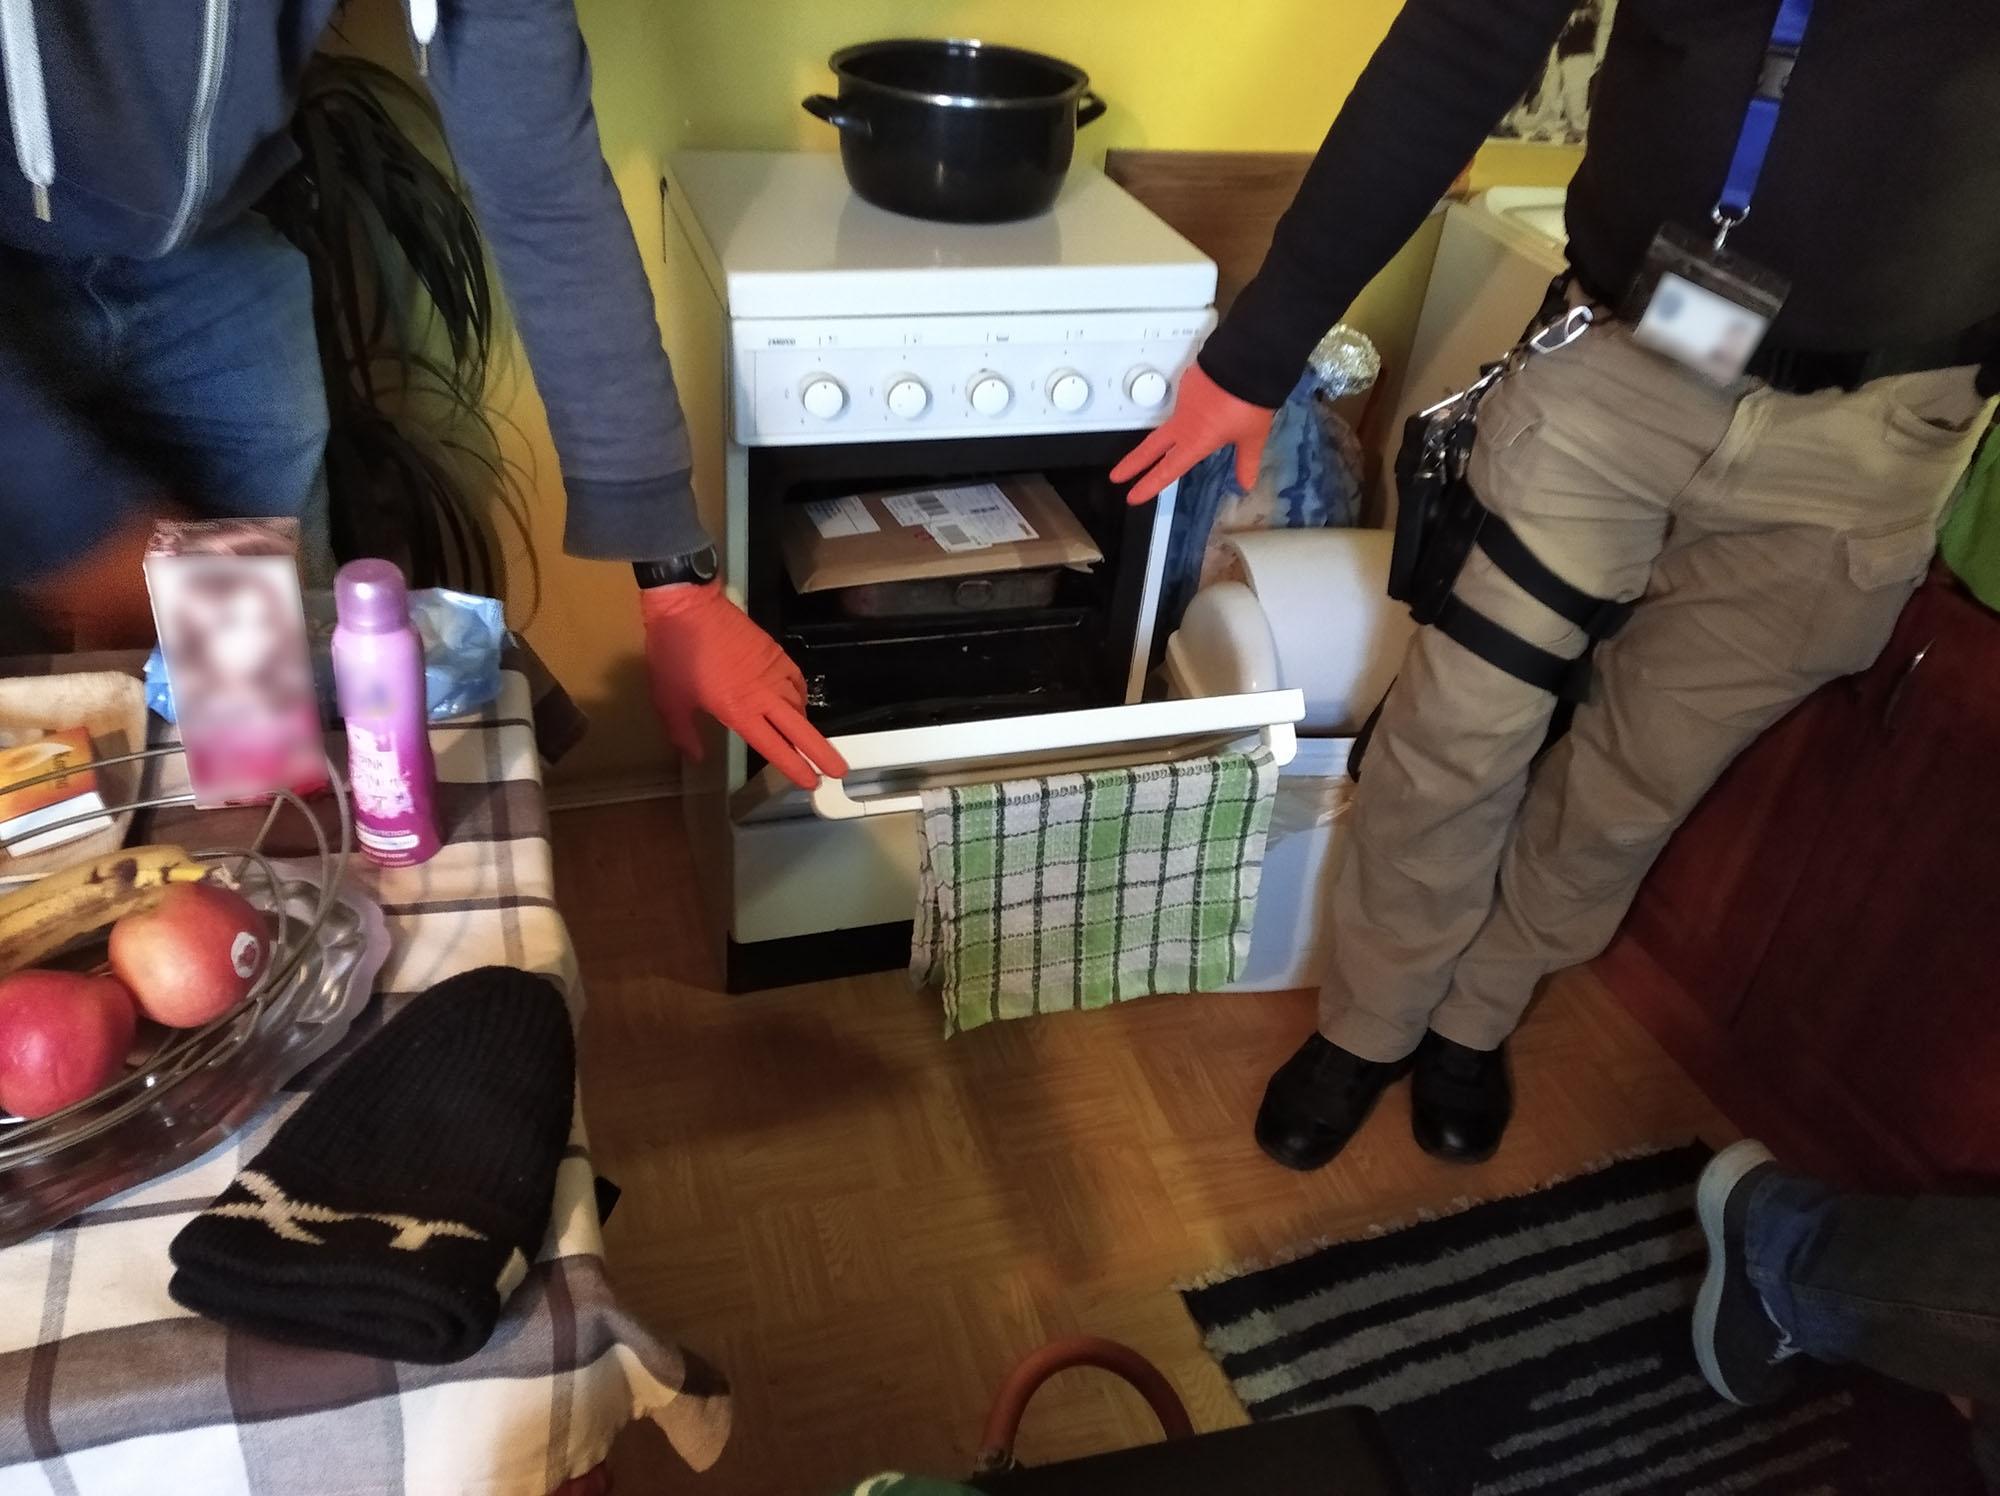 Darknetes drogkereskedőt fogtak Balatonfüreden